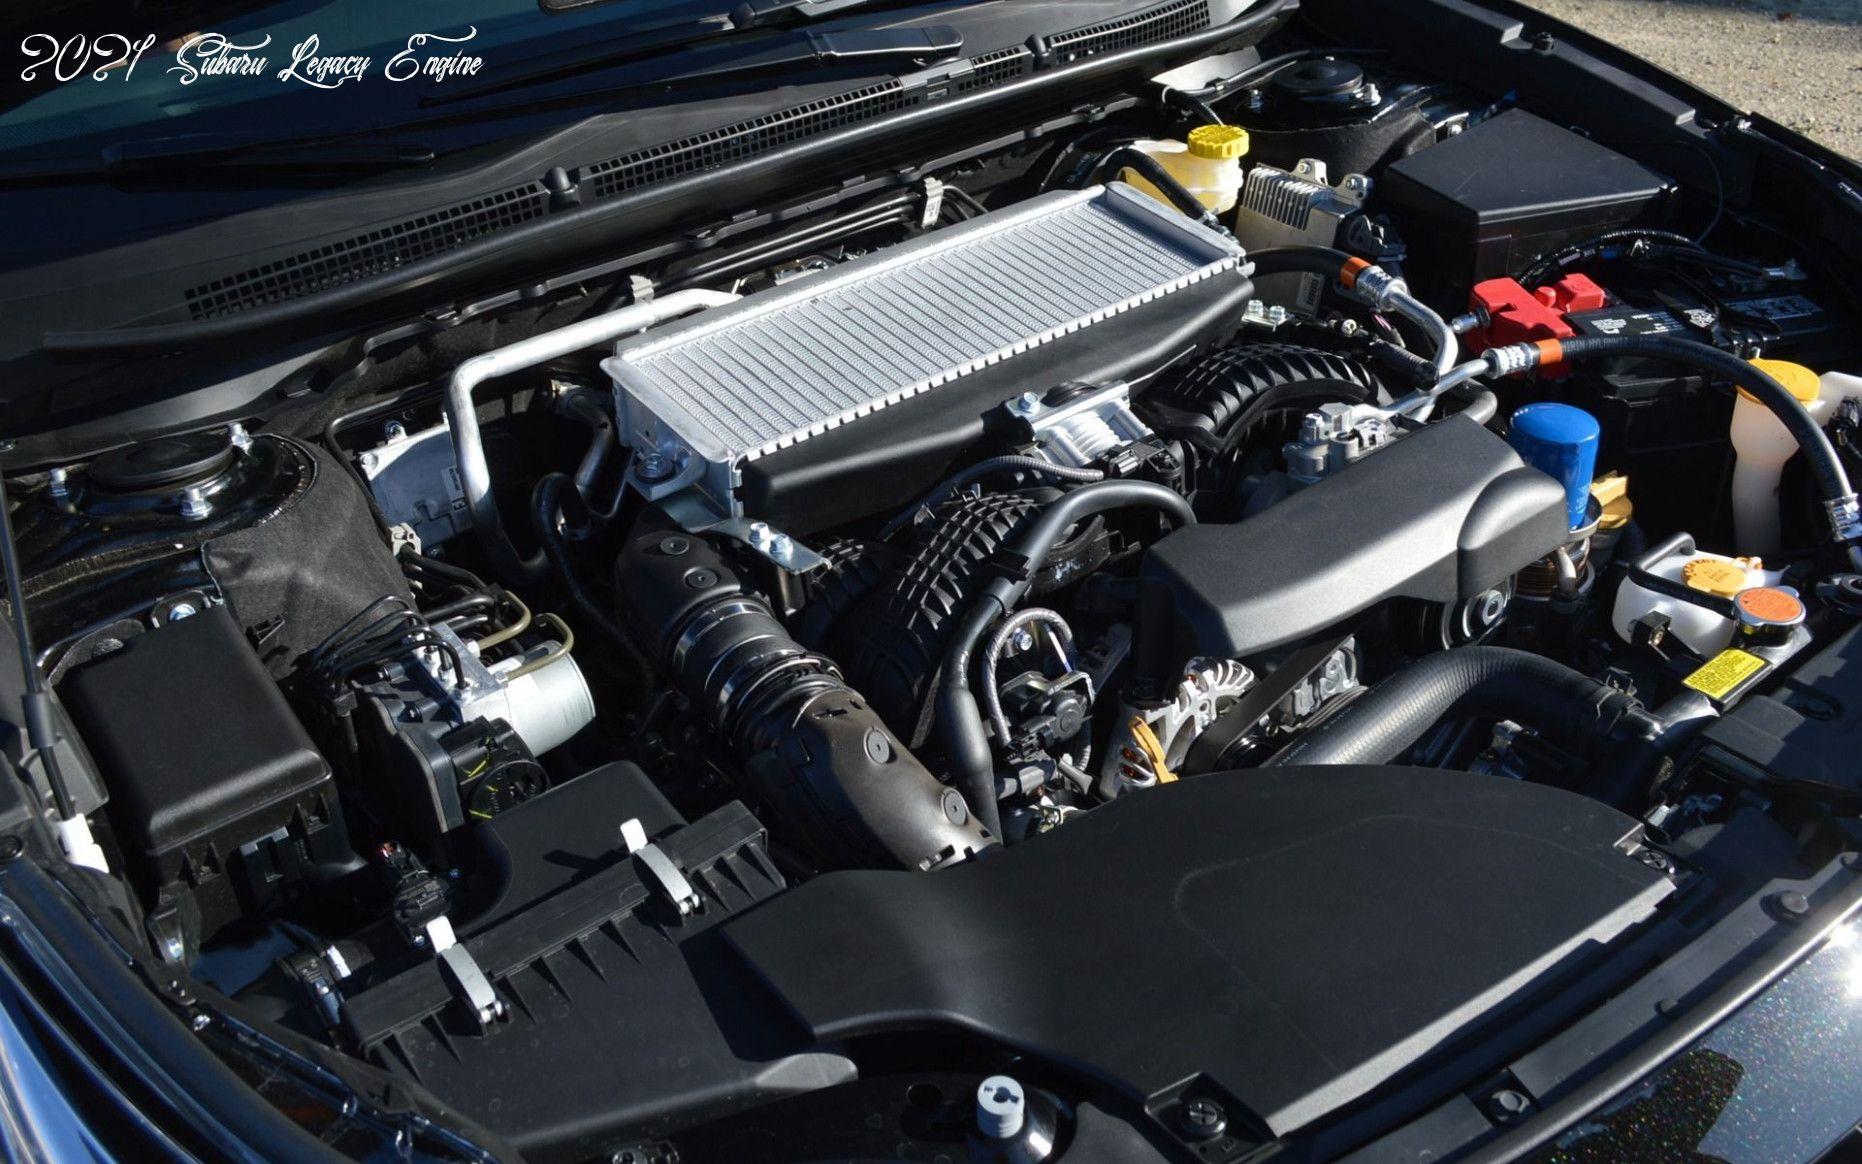 2021 Subaru Legacy Engine Configurations In 2020 Subaru Legacy Subaru Engineering